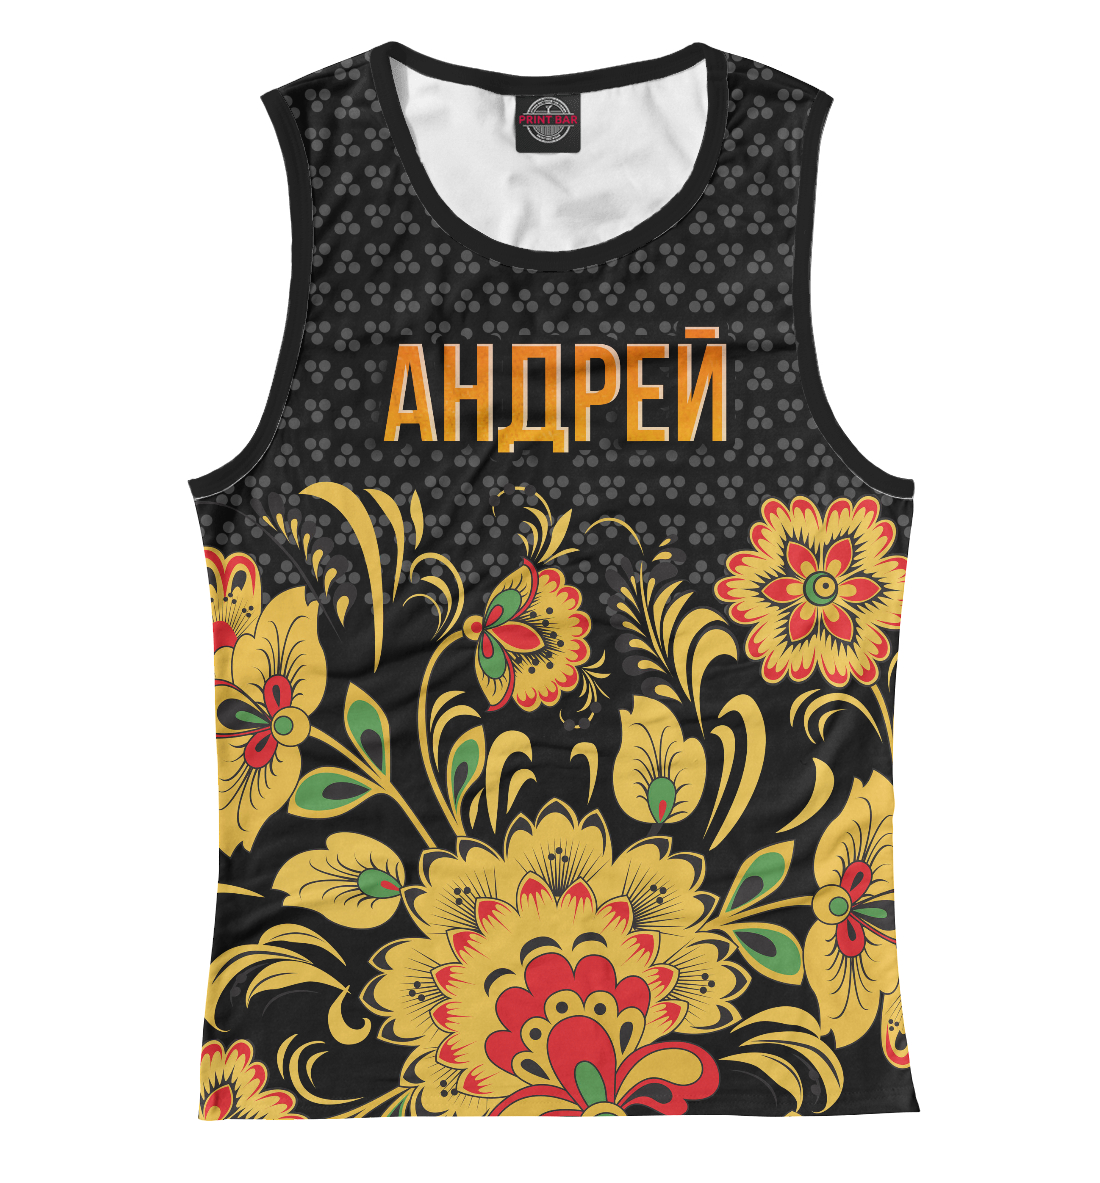 Купить Хохлома Андрей, Printbar, Майки, AND-458246-may-1